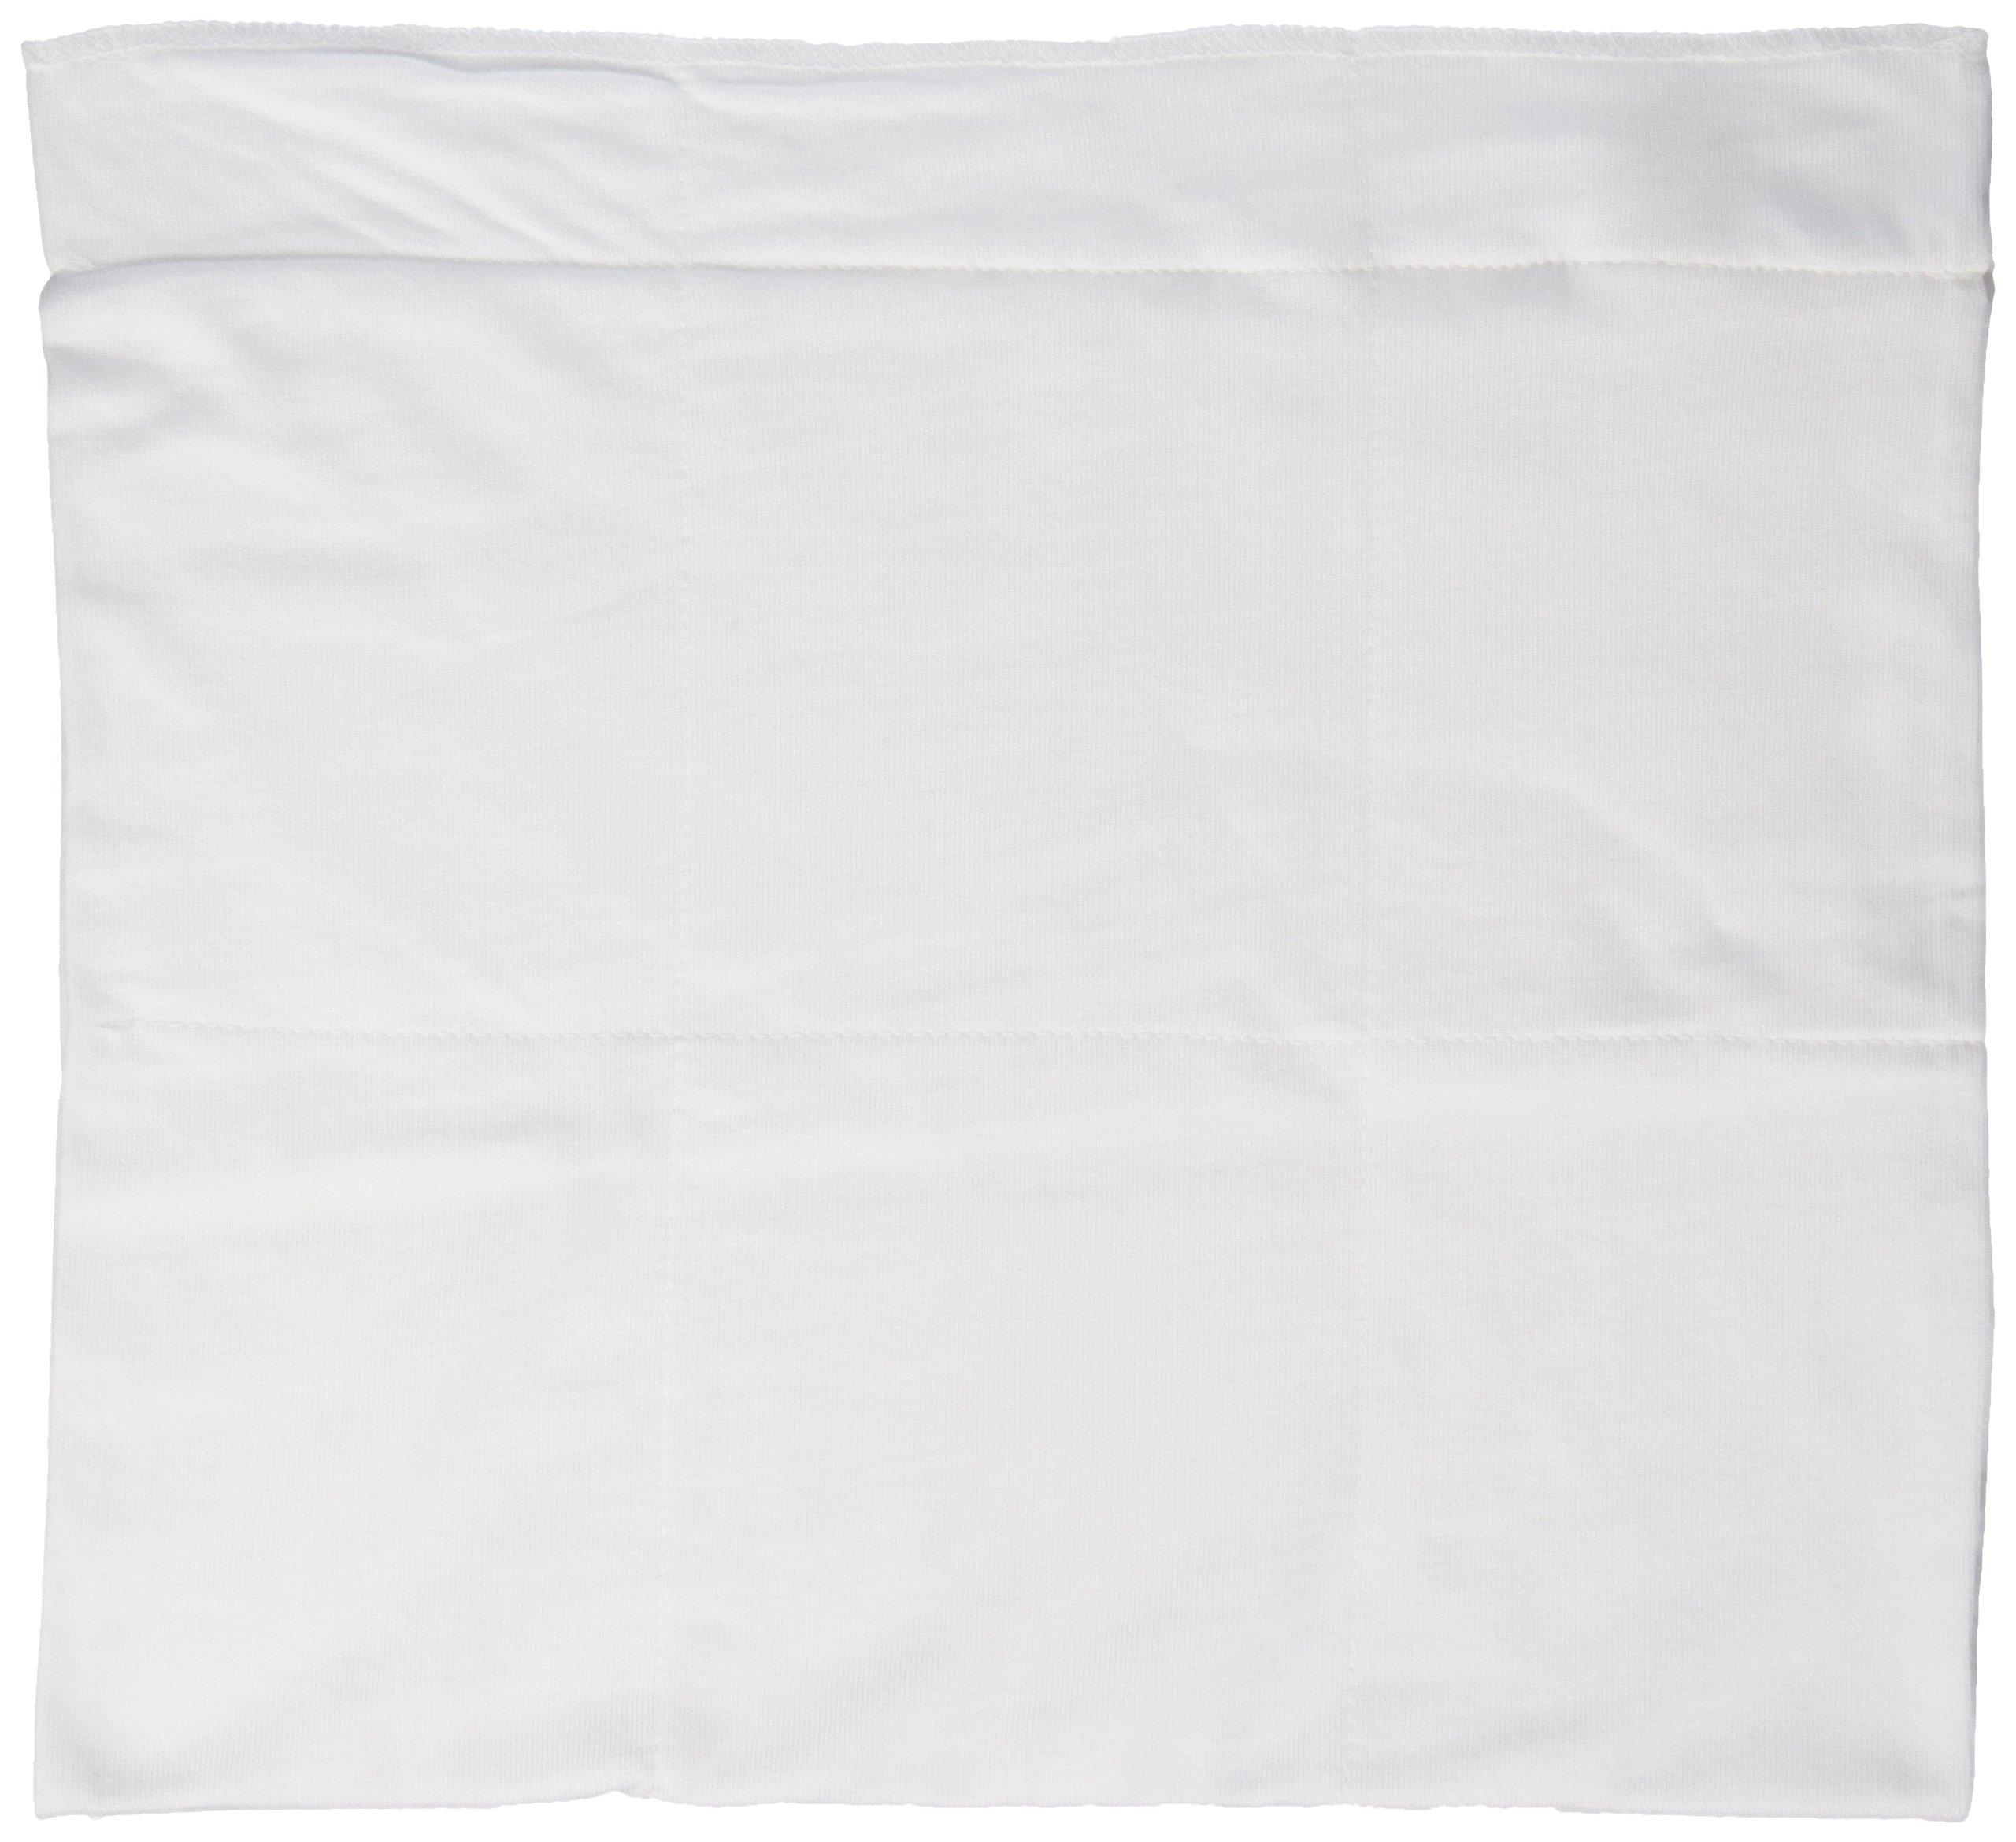 Thirsties Duo Hemp Prefold Cloth Diaper - White - Size 1